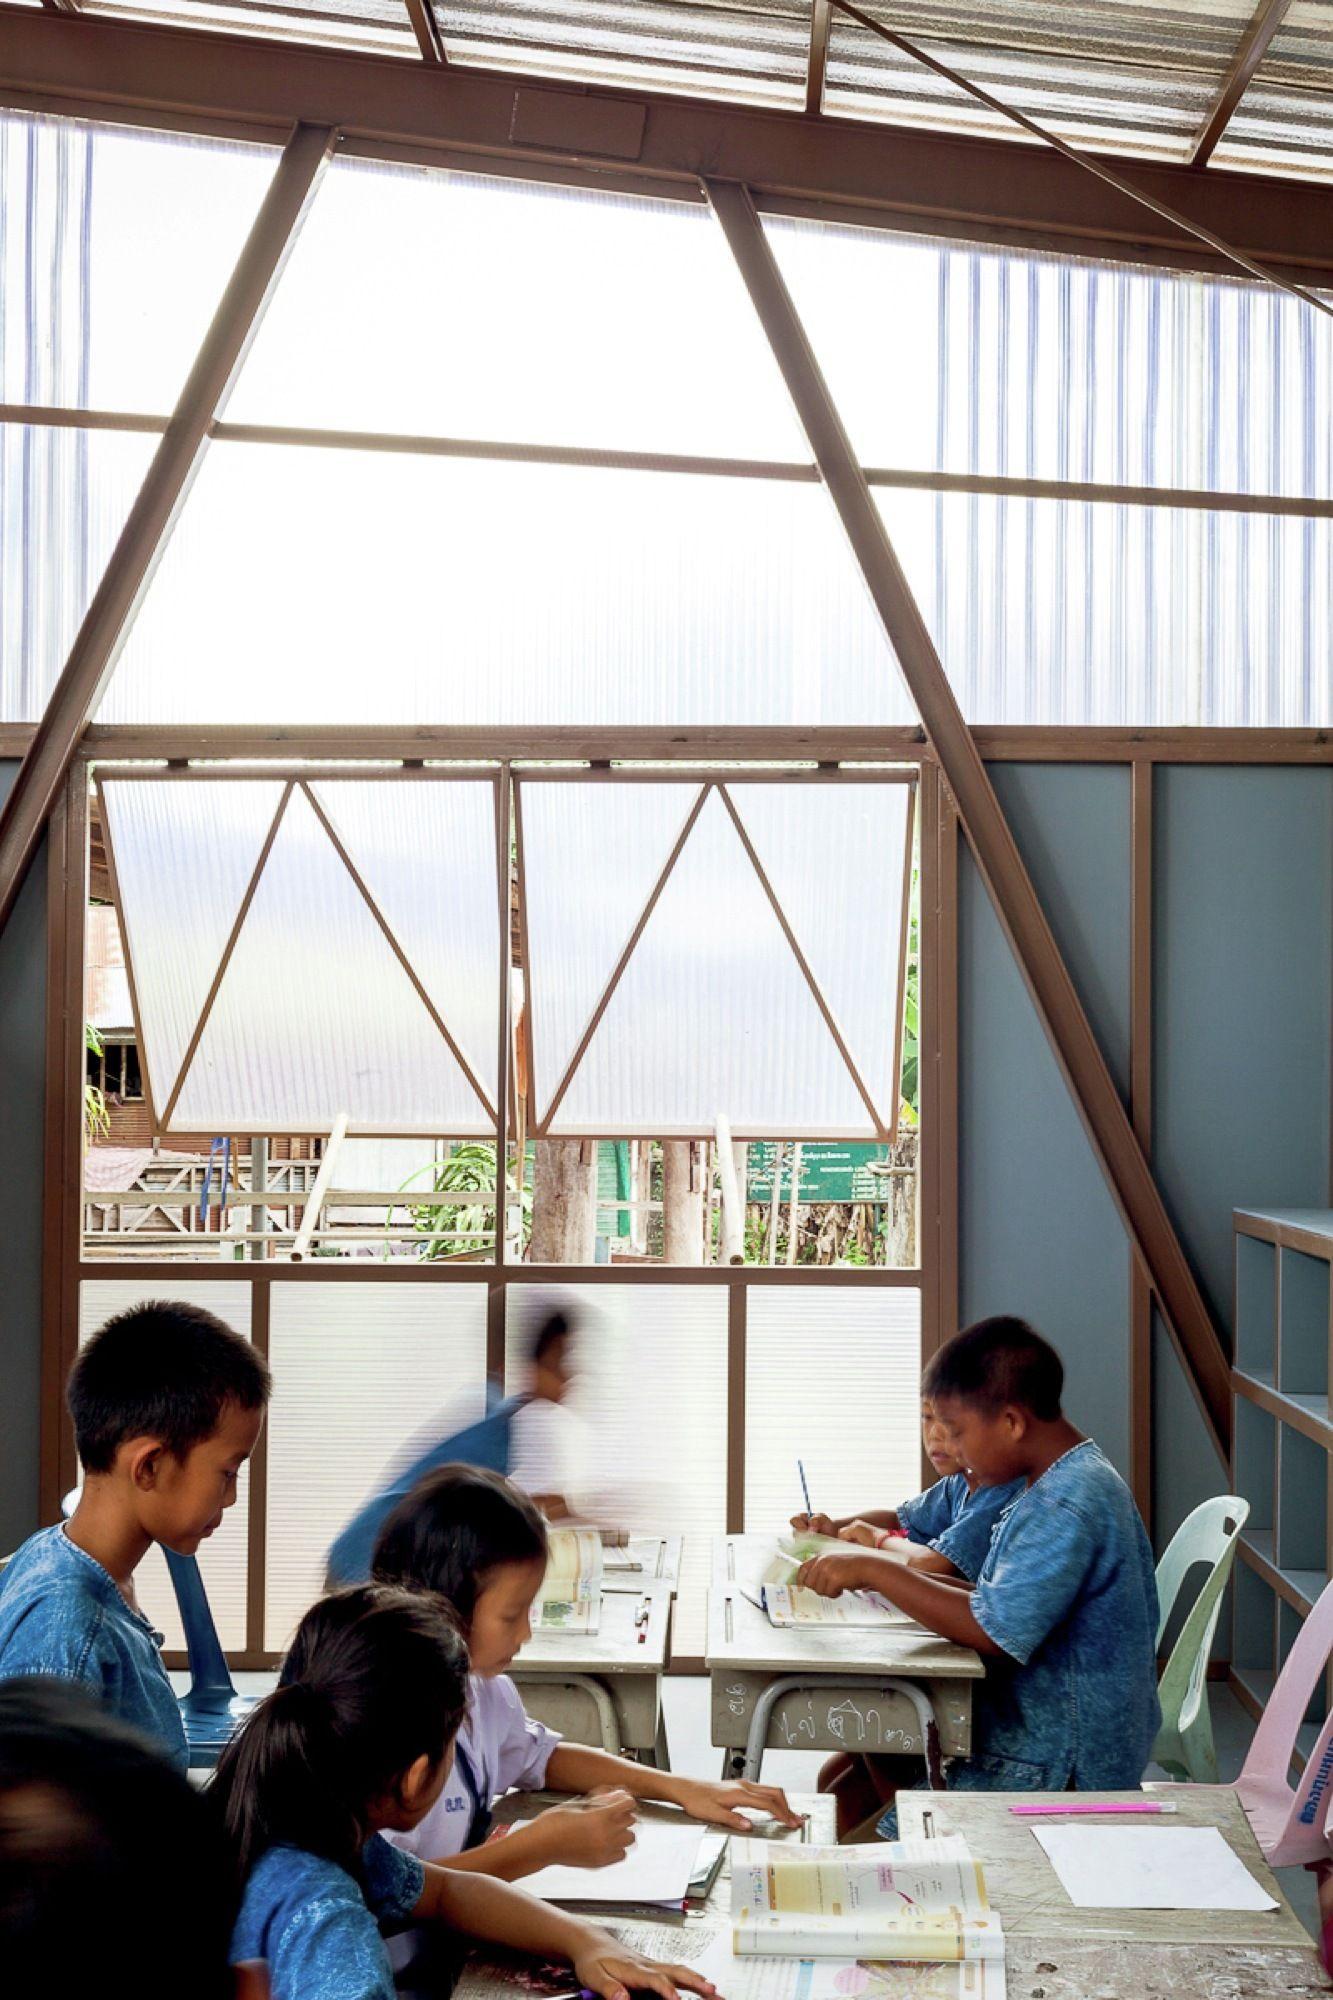 Nigeria house window design  g   alternative school designs  pinterest  school